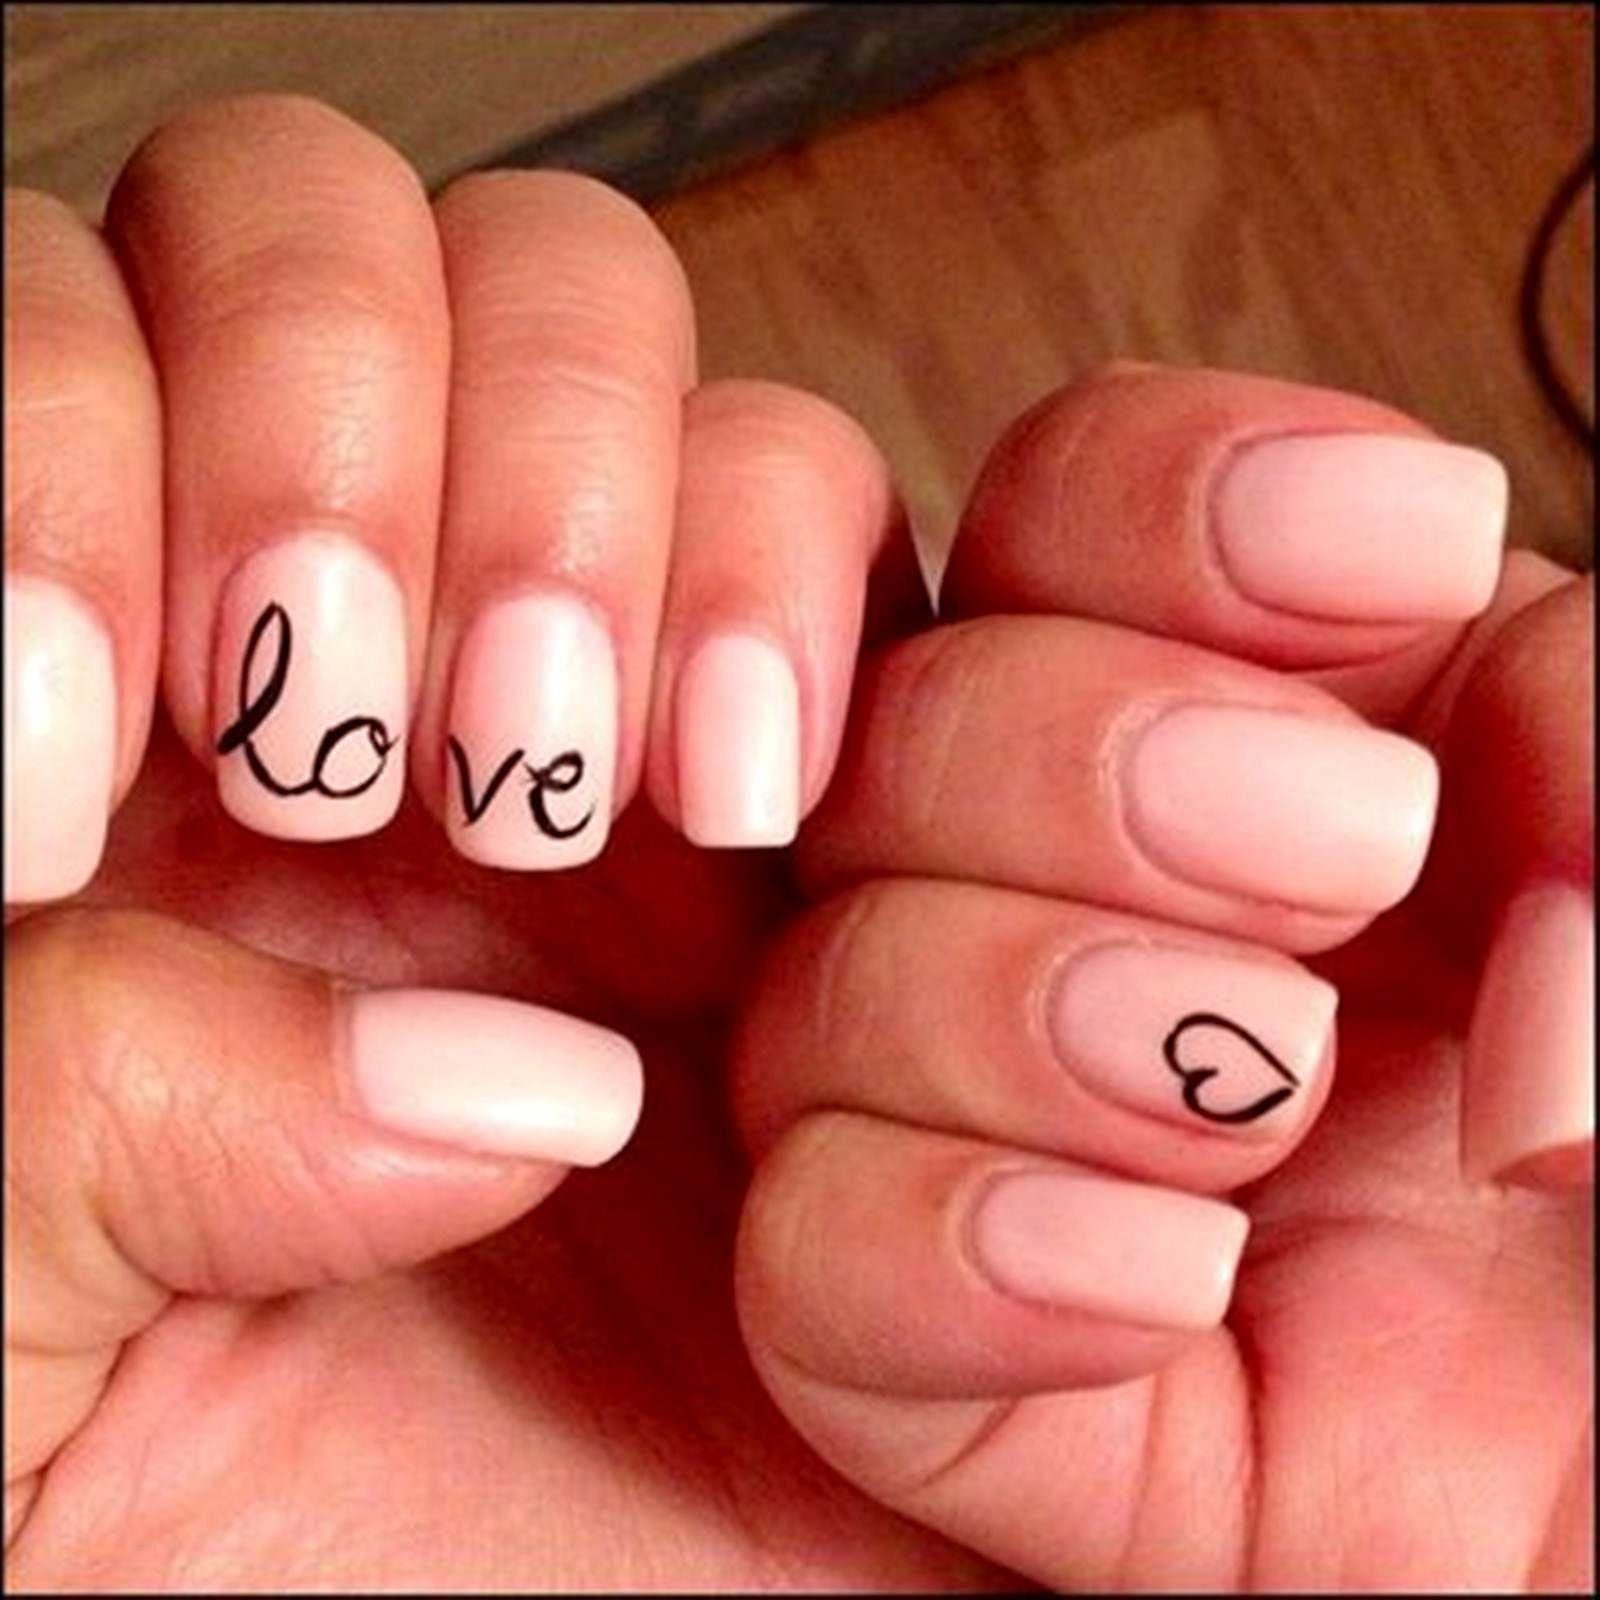 acrylic nail designs   σχέδια νυχια   Pinterest   Acrylic nail ...